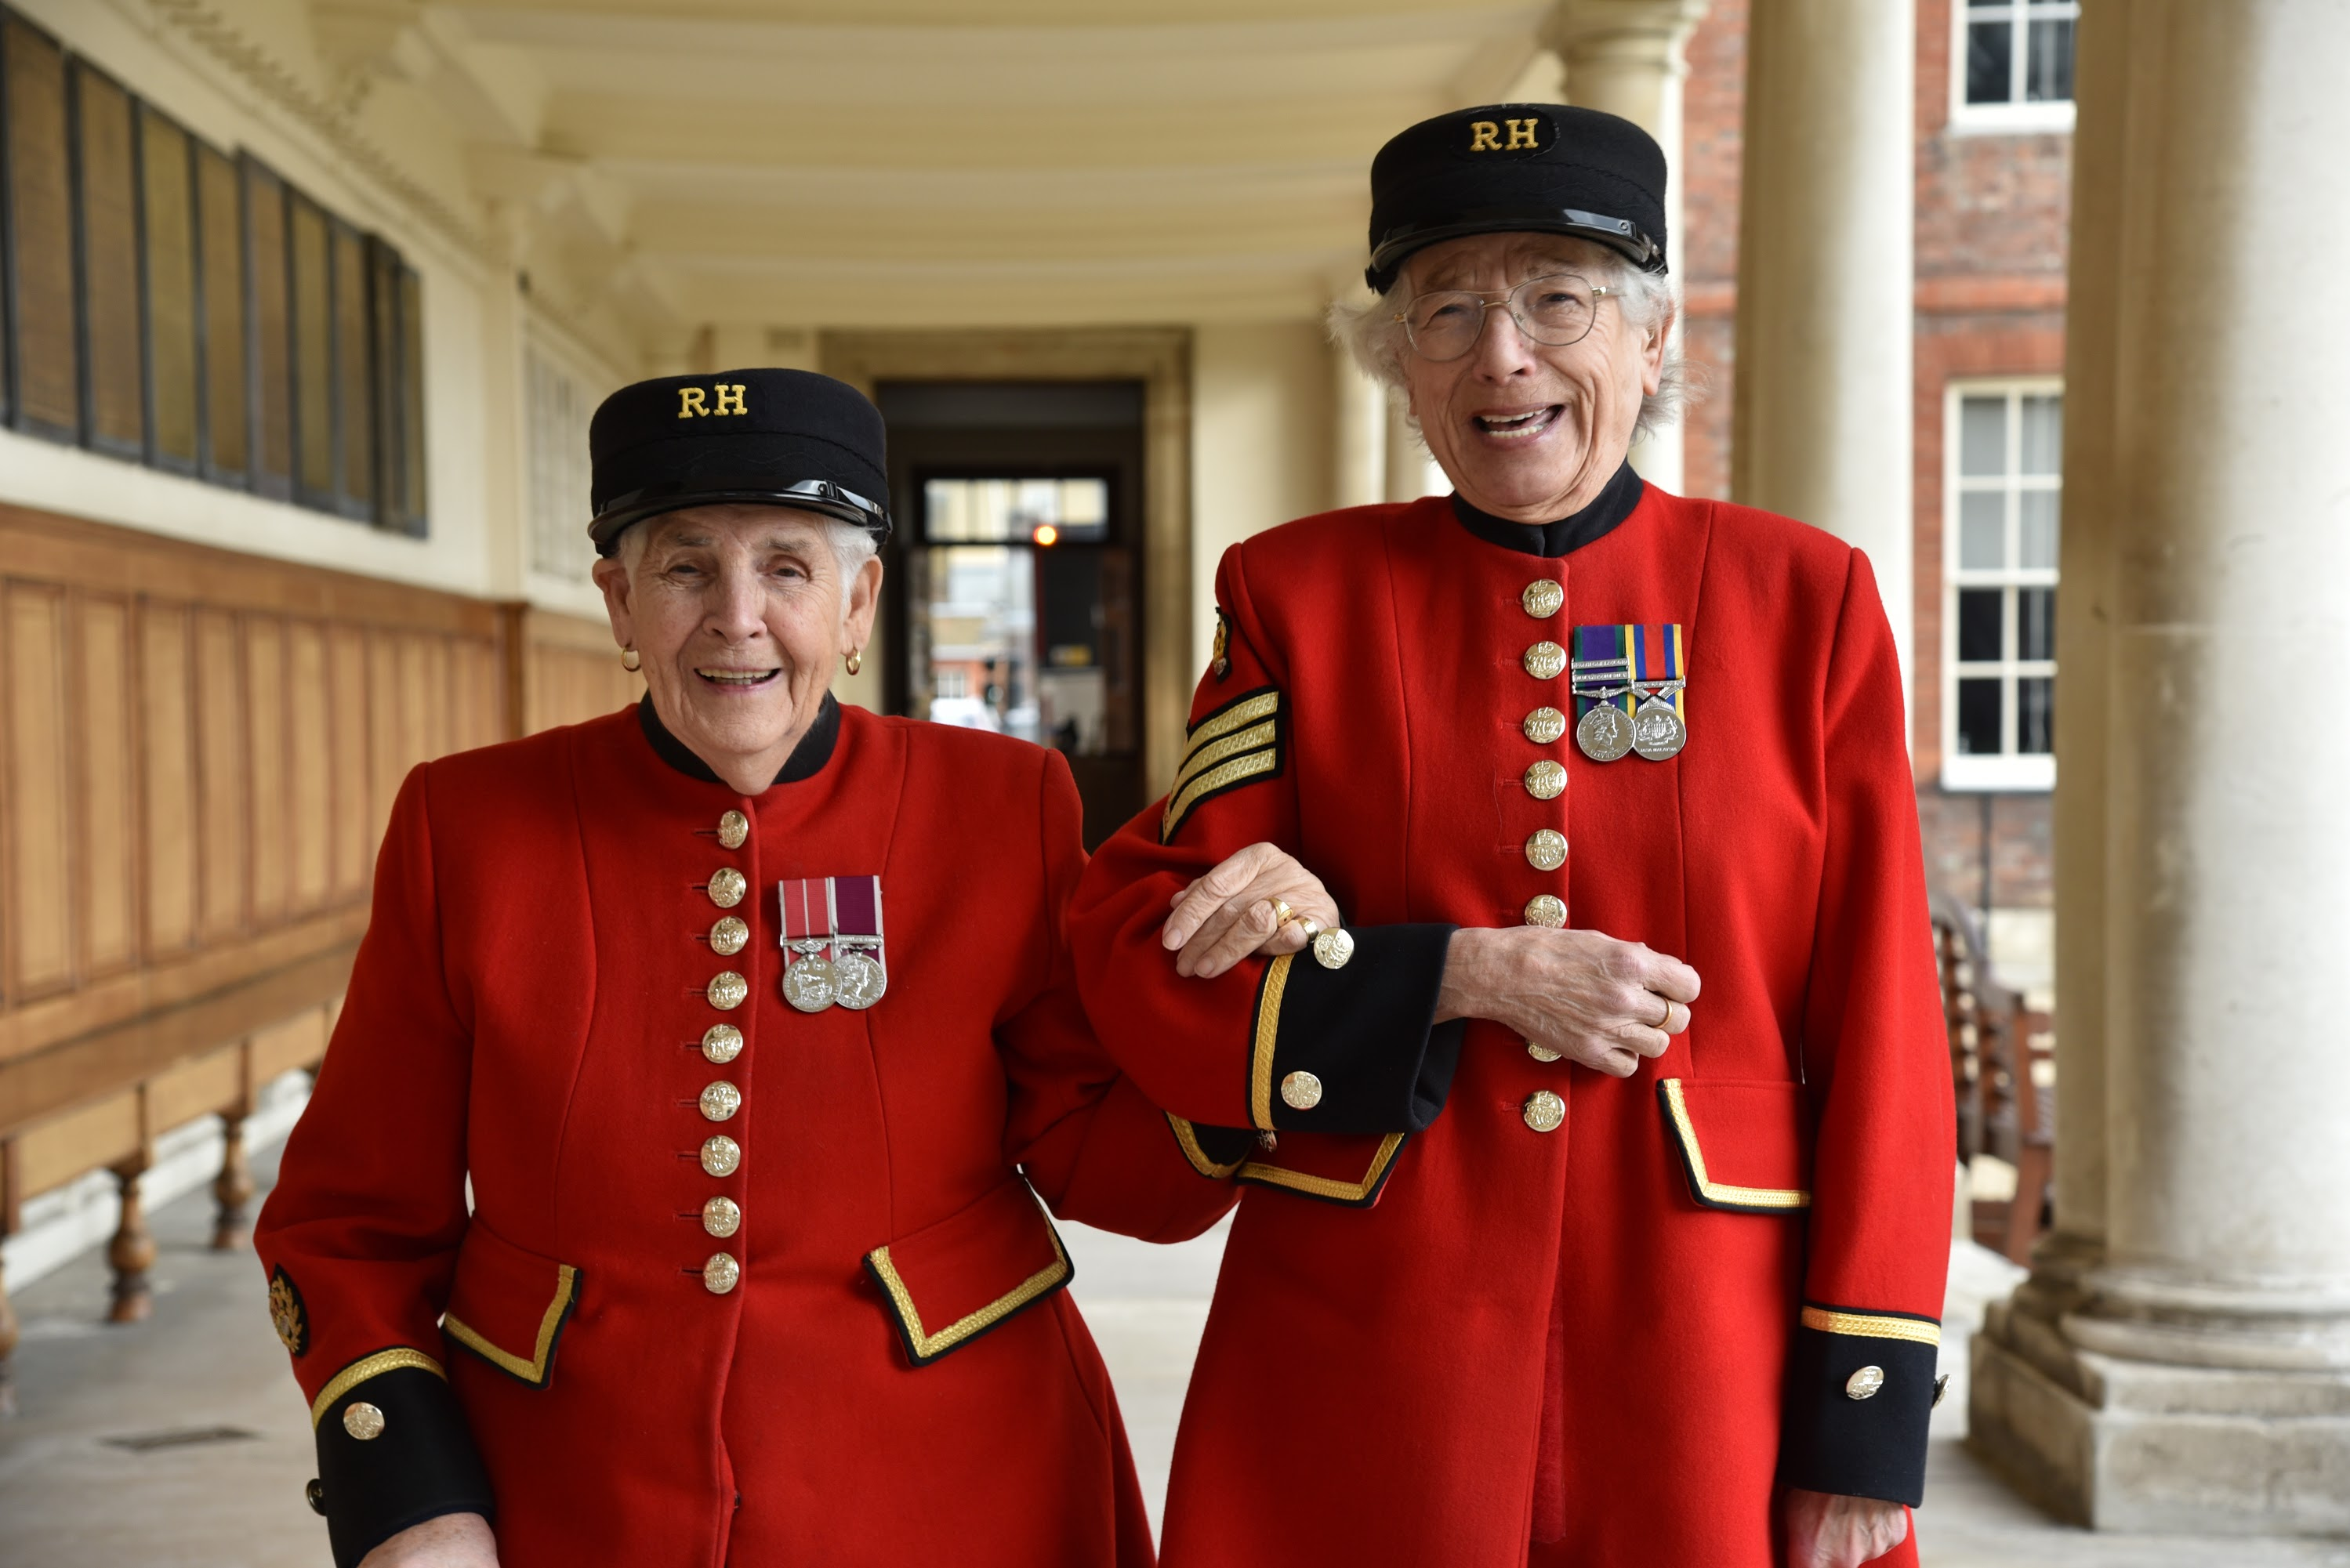 Chelsea Pensioners Marjorie & Audrey